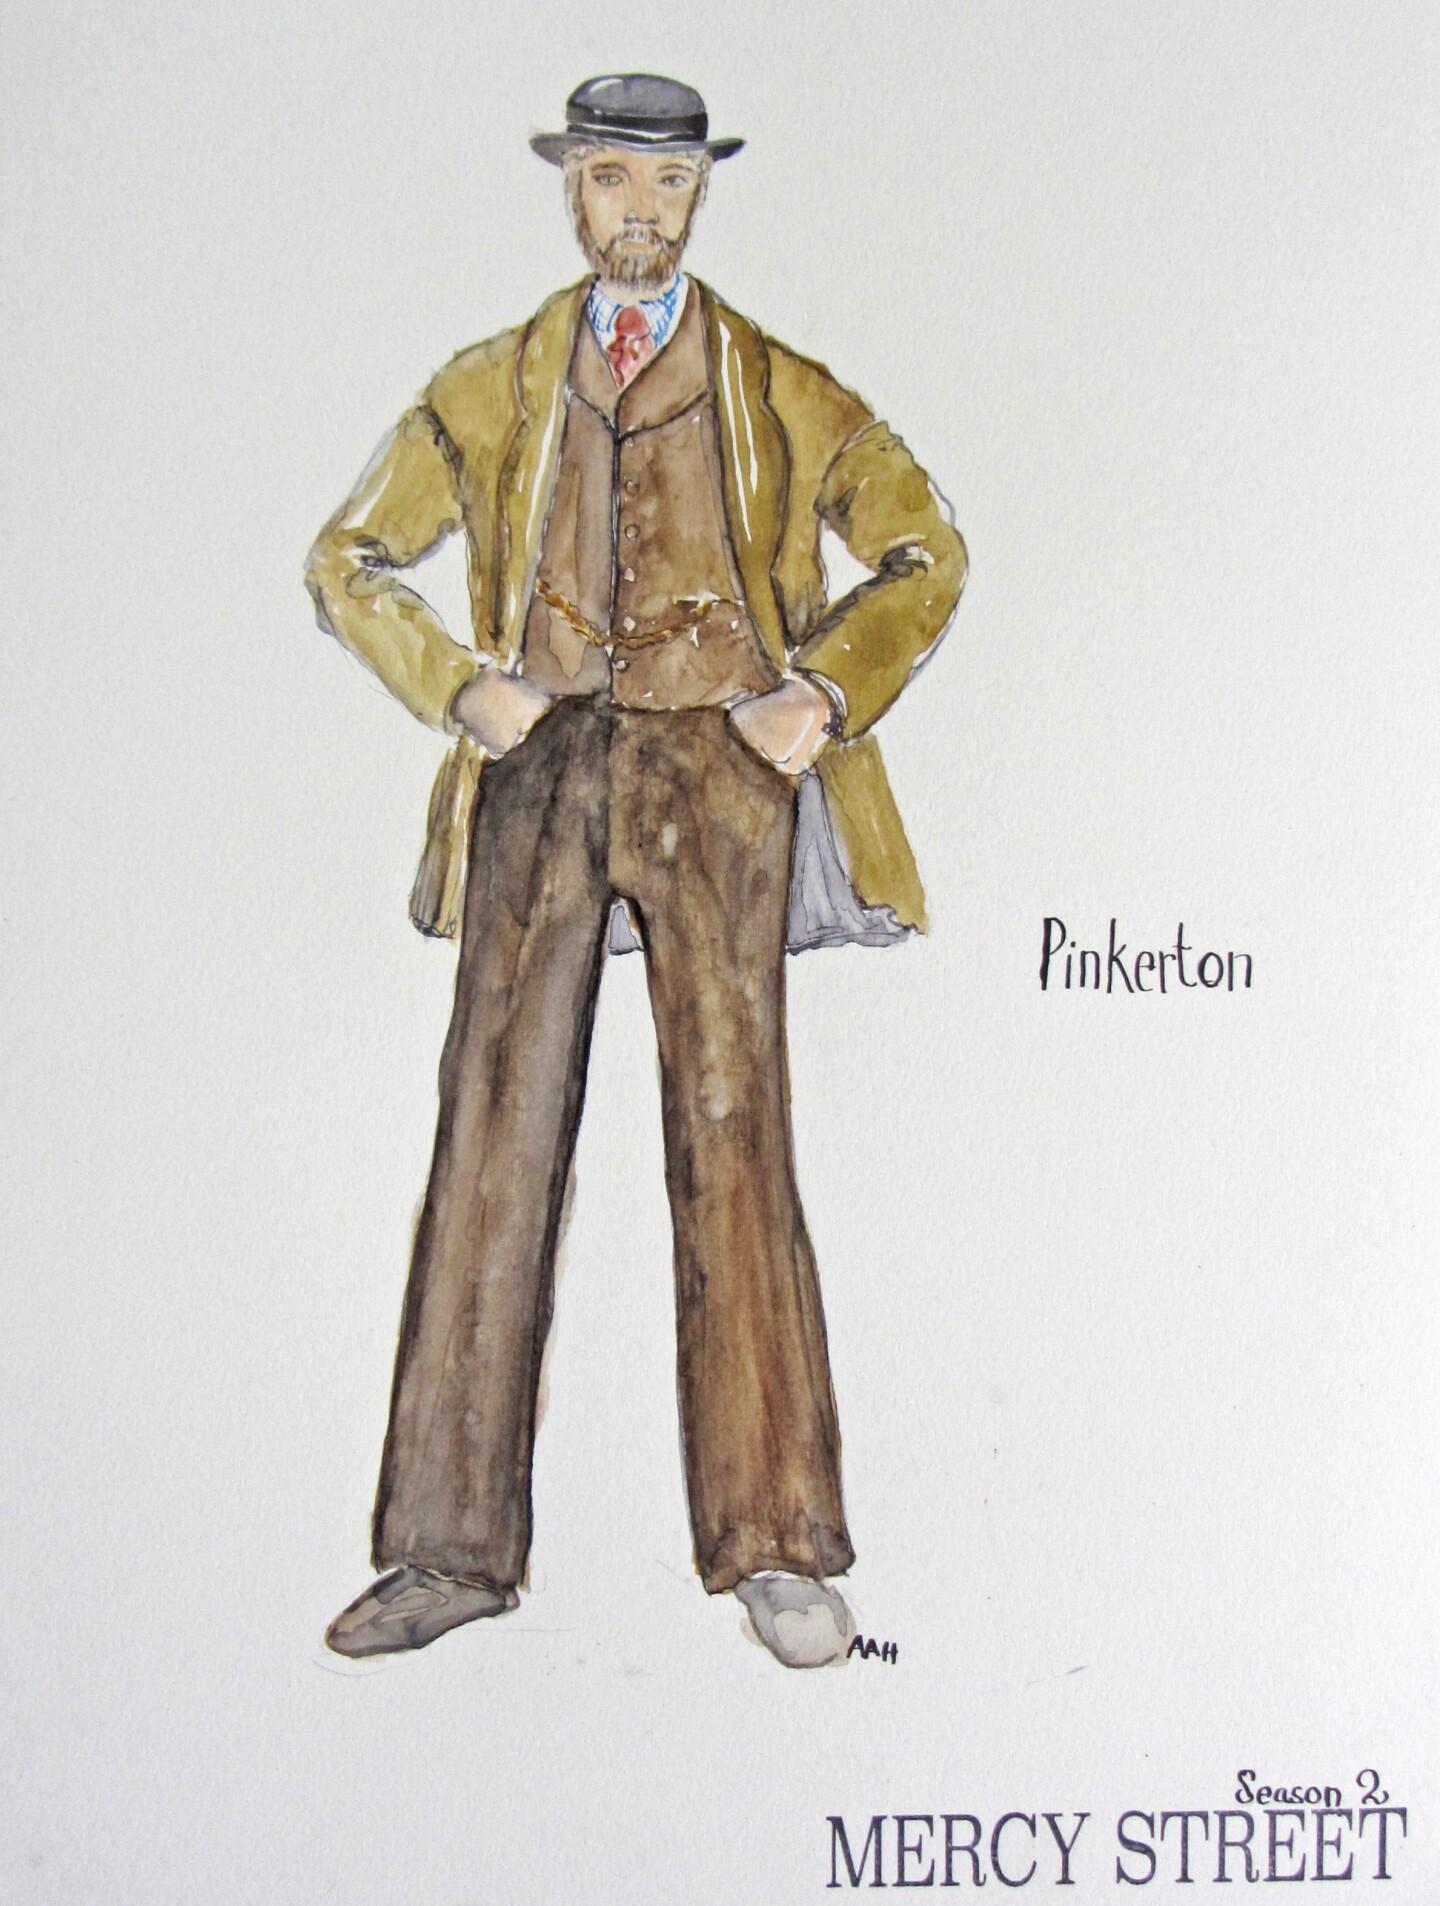 Pinkerton - Mercy Street